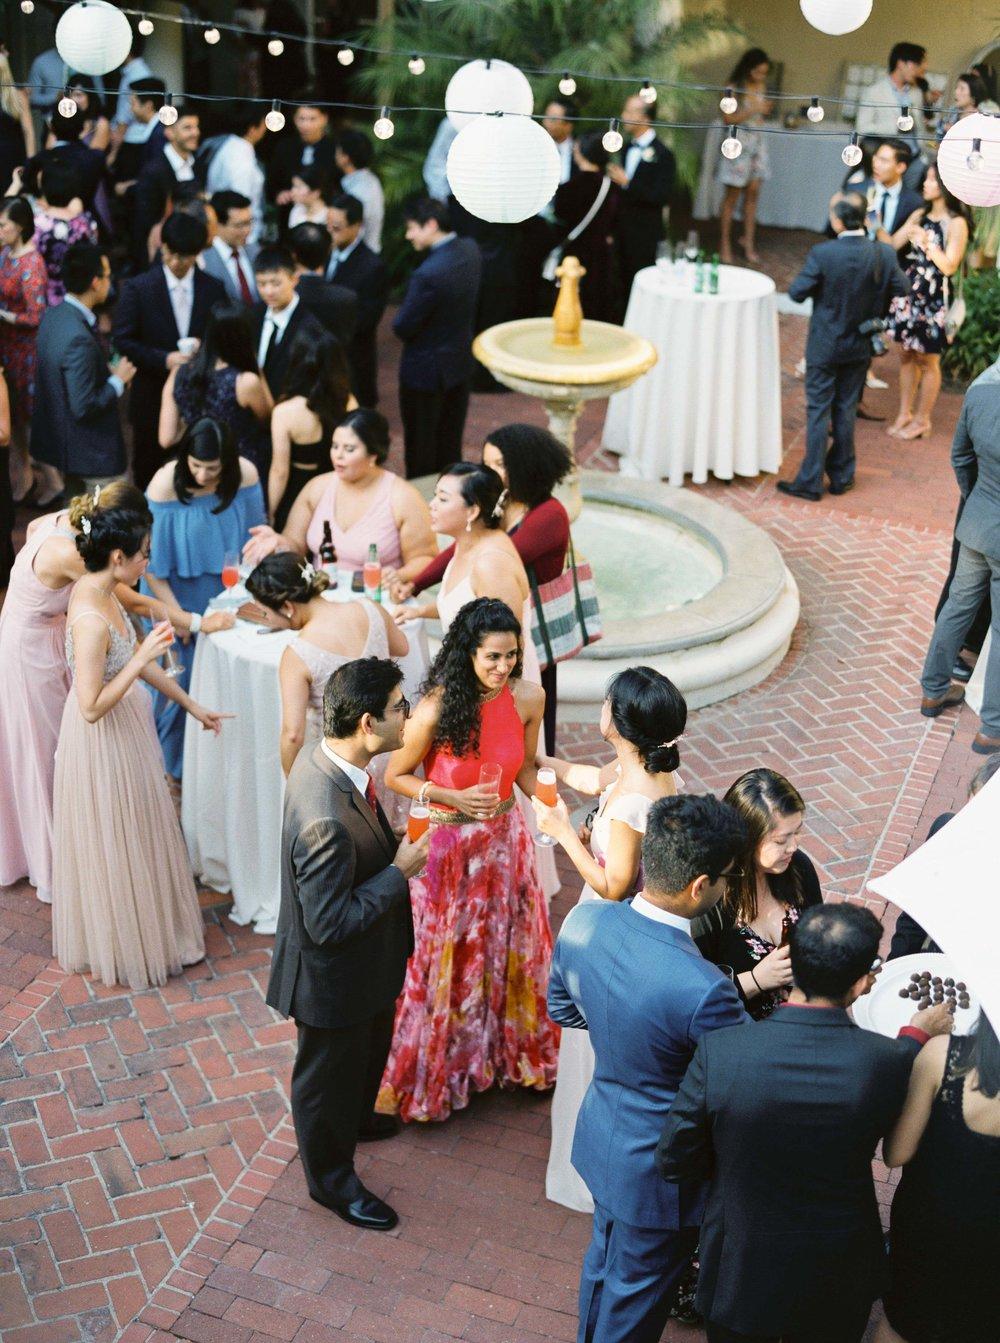 Villa_Montalvo_Wedding_Photographer_Videographer_San_Francisco109.jpg